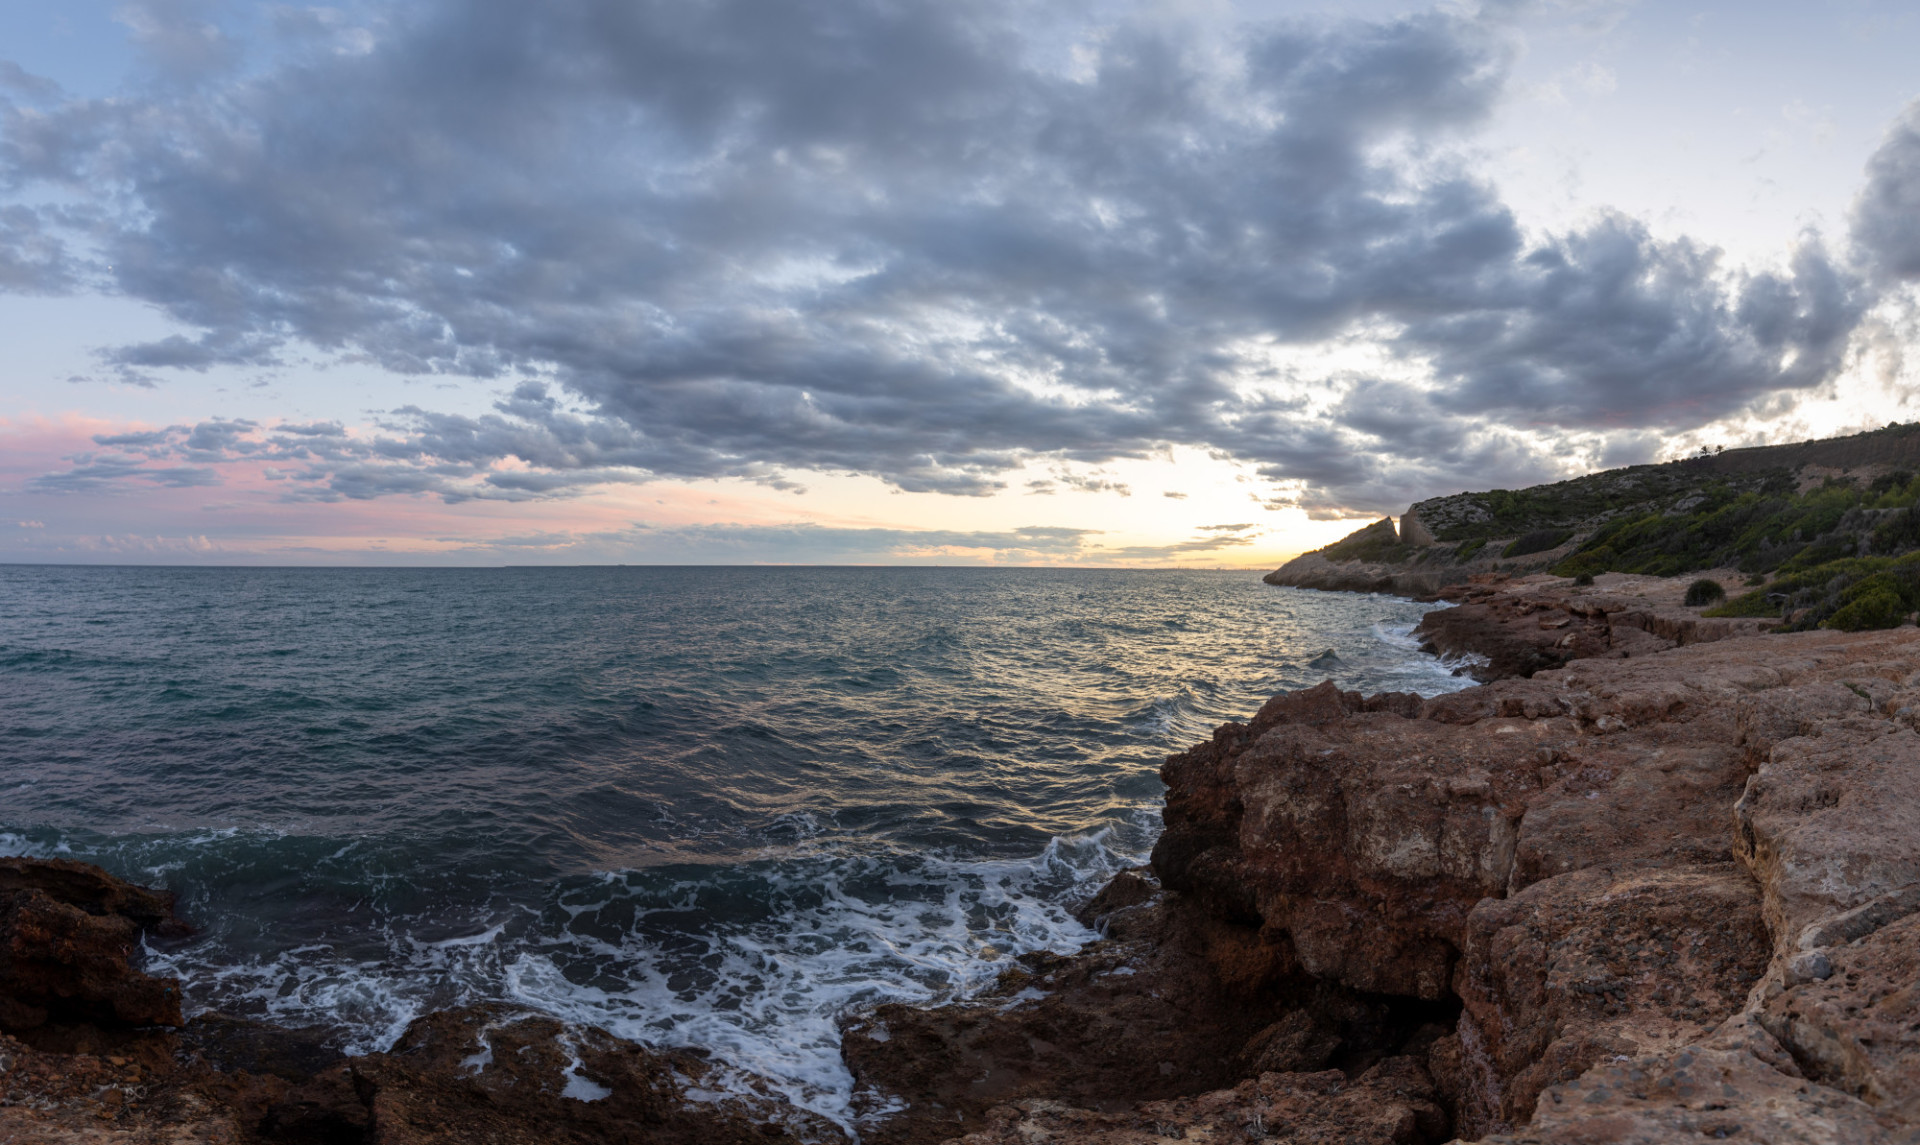 Passage de La Renega Seascape